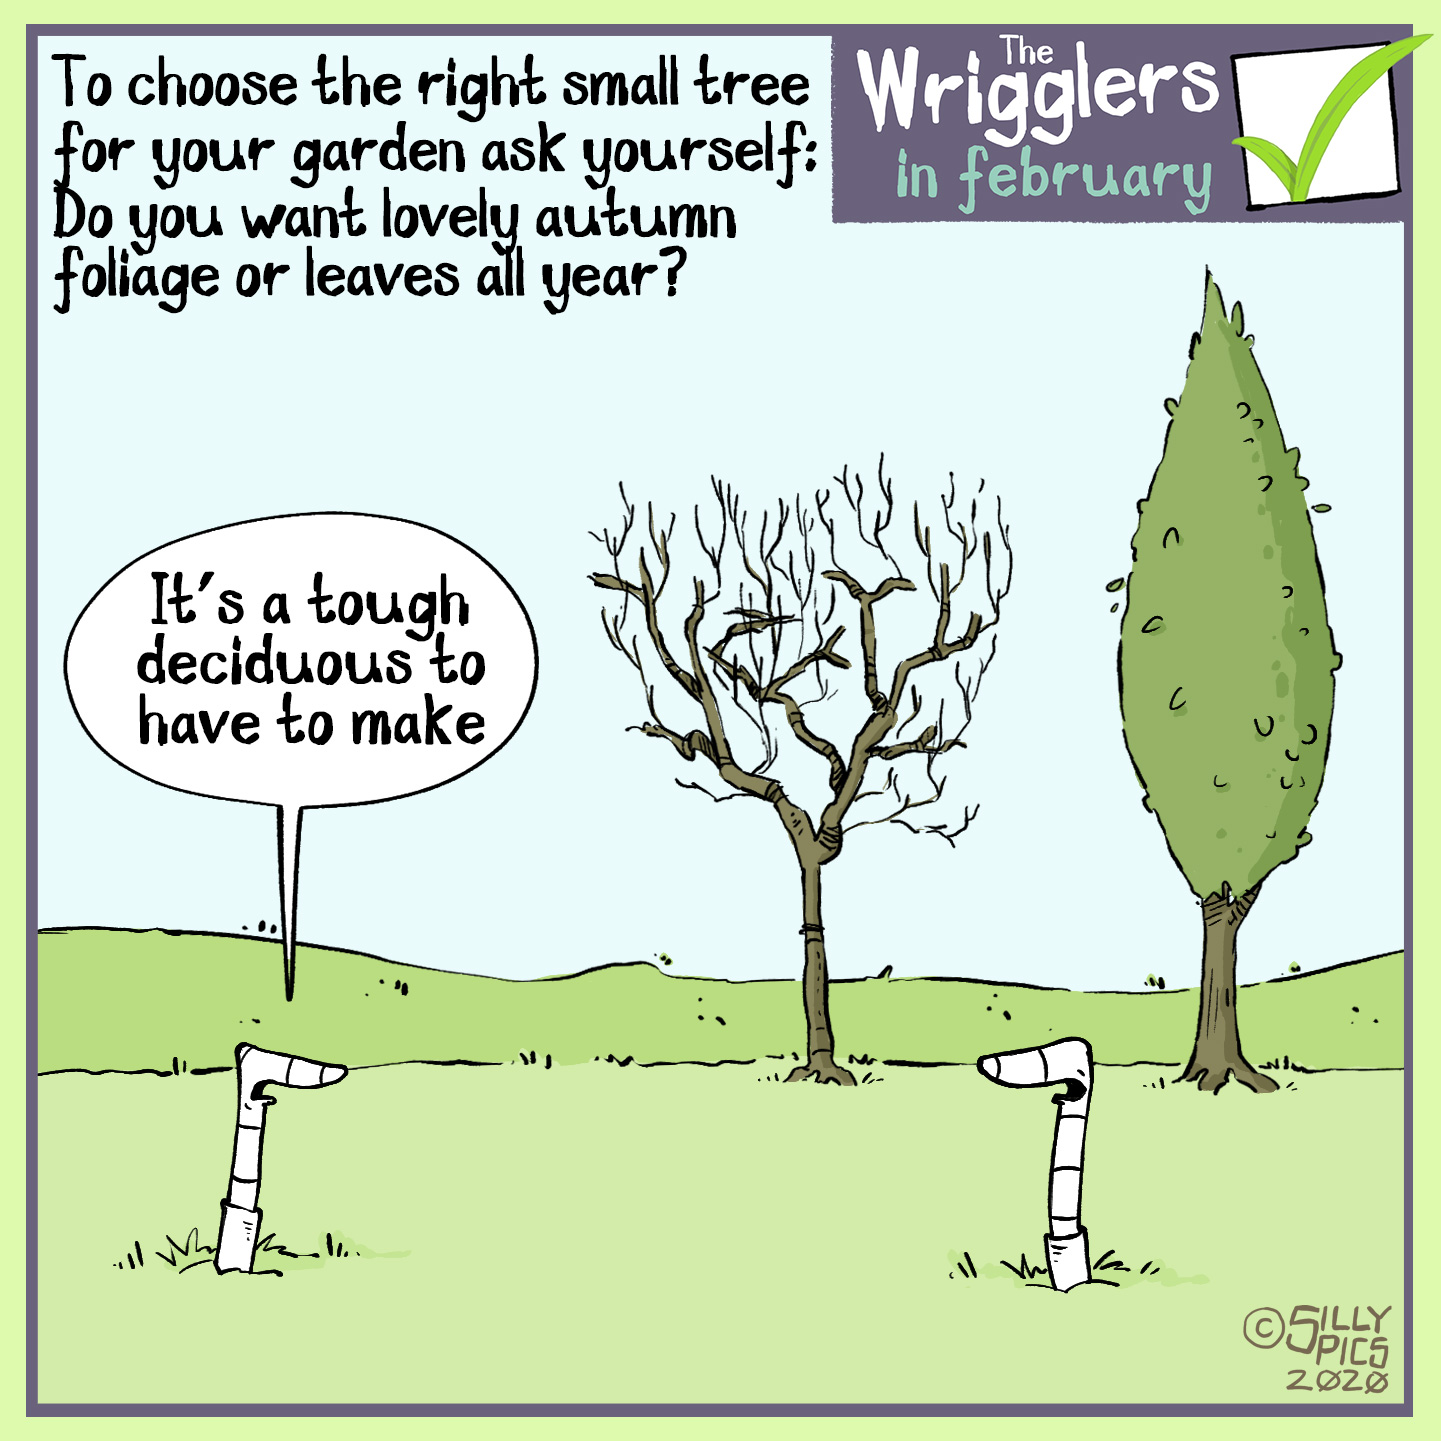 when choosing a tree cartoon, deciduous or evergreen?